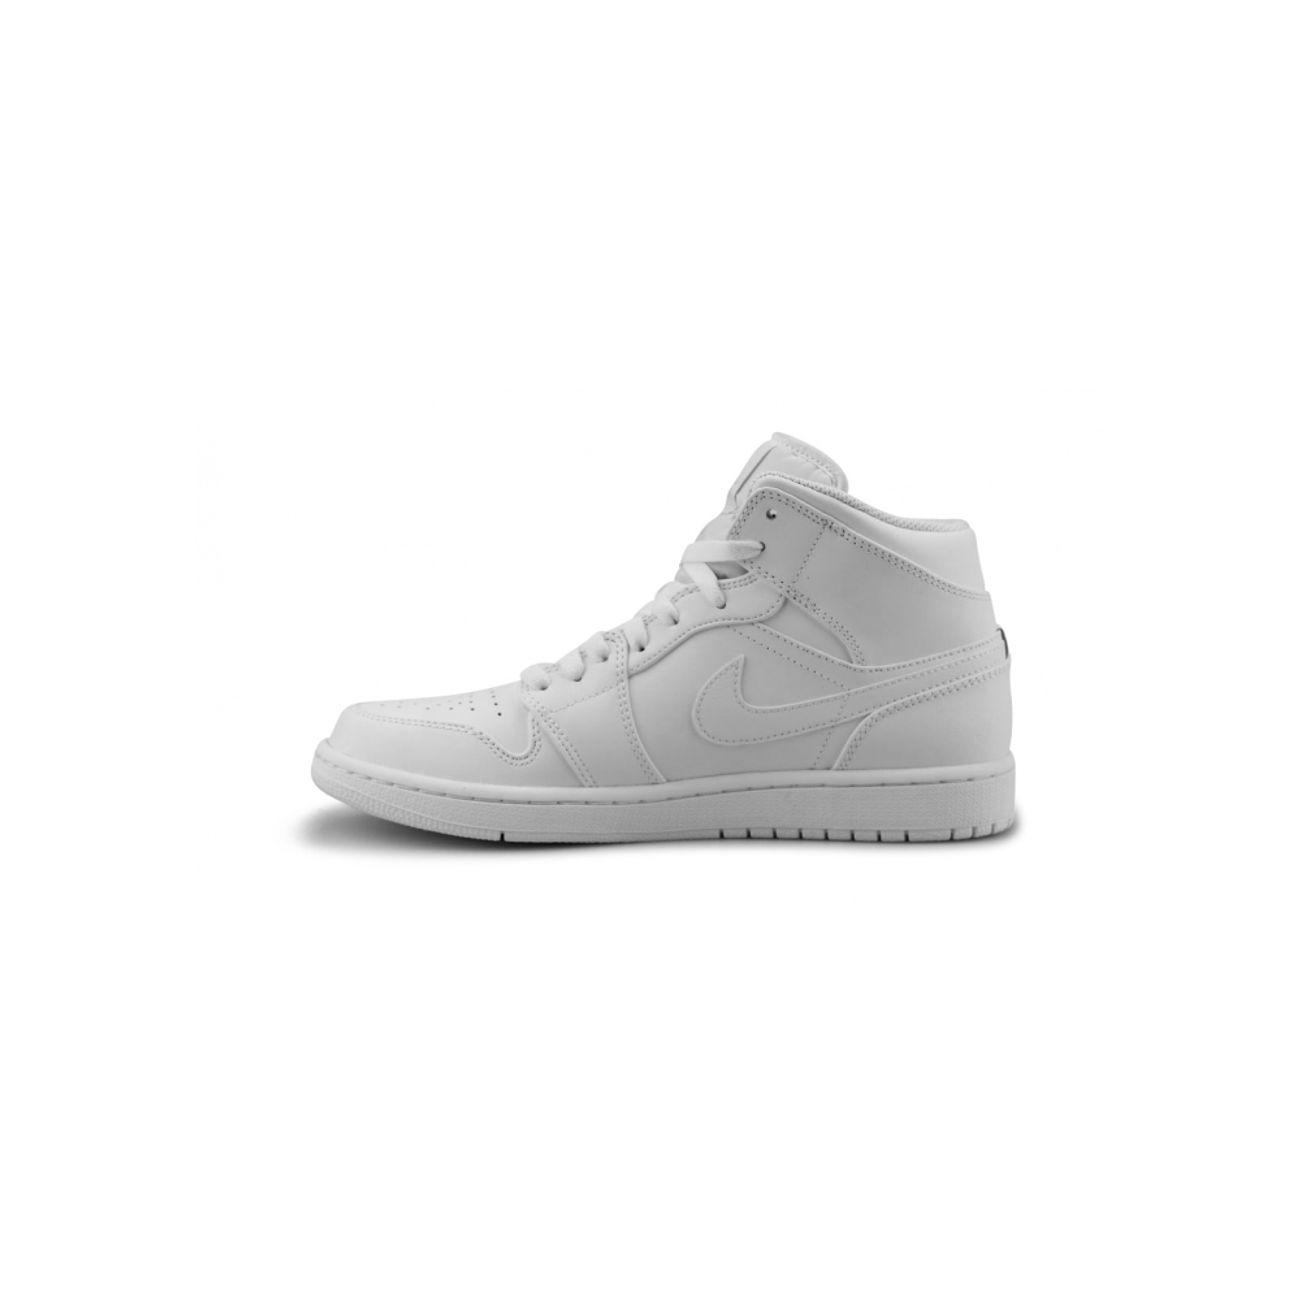 Air Nike Blanc Basket 104 Jordan ModeLifestyle Homme Mid 554724 1 sCxthrQd